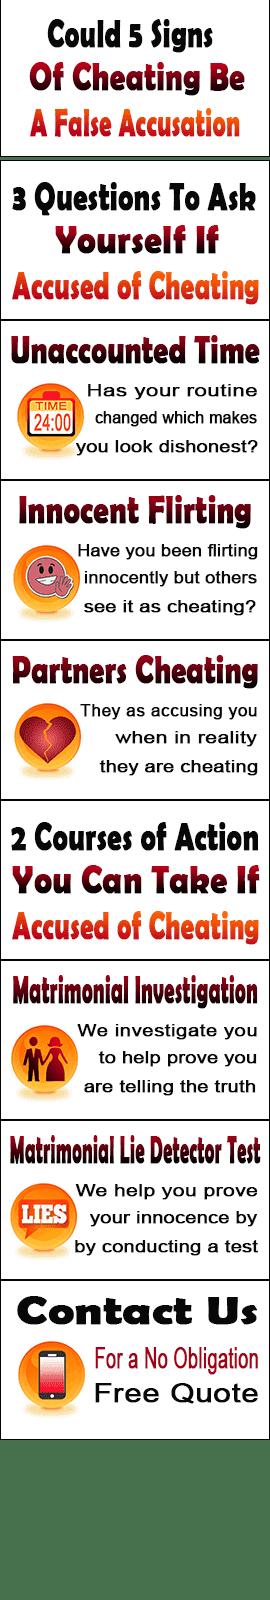 flirting vs cheating infidelity scene quotes free image